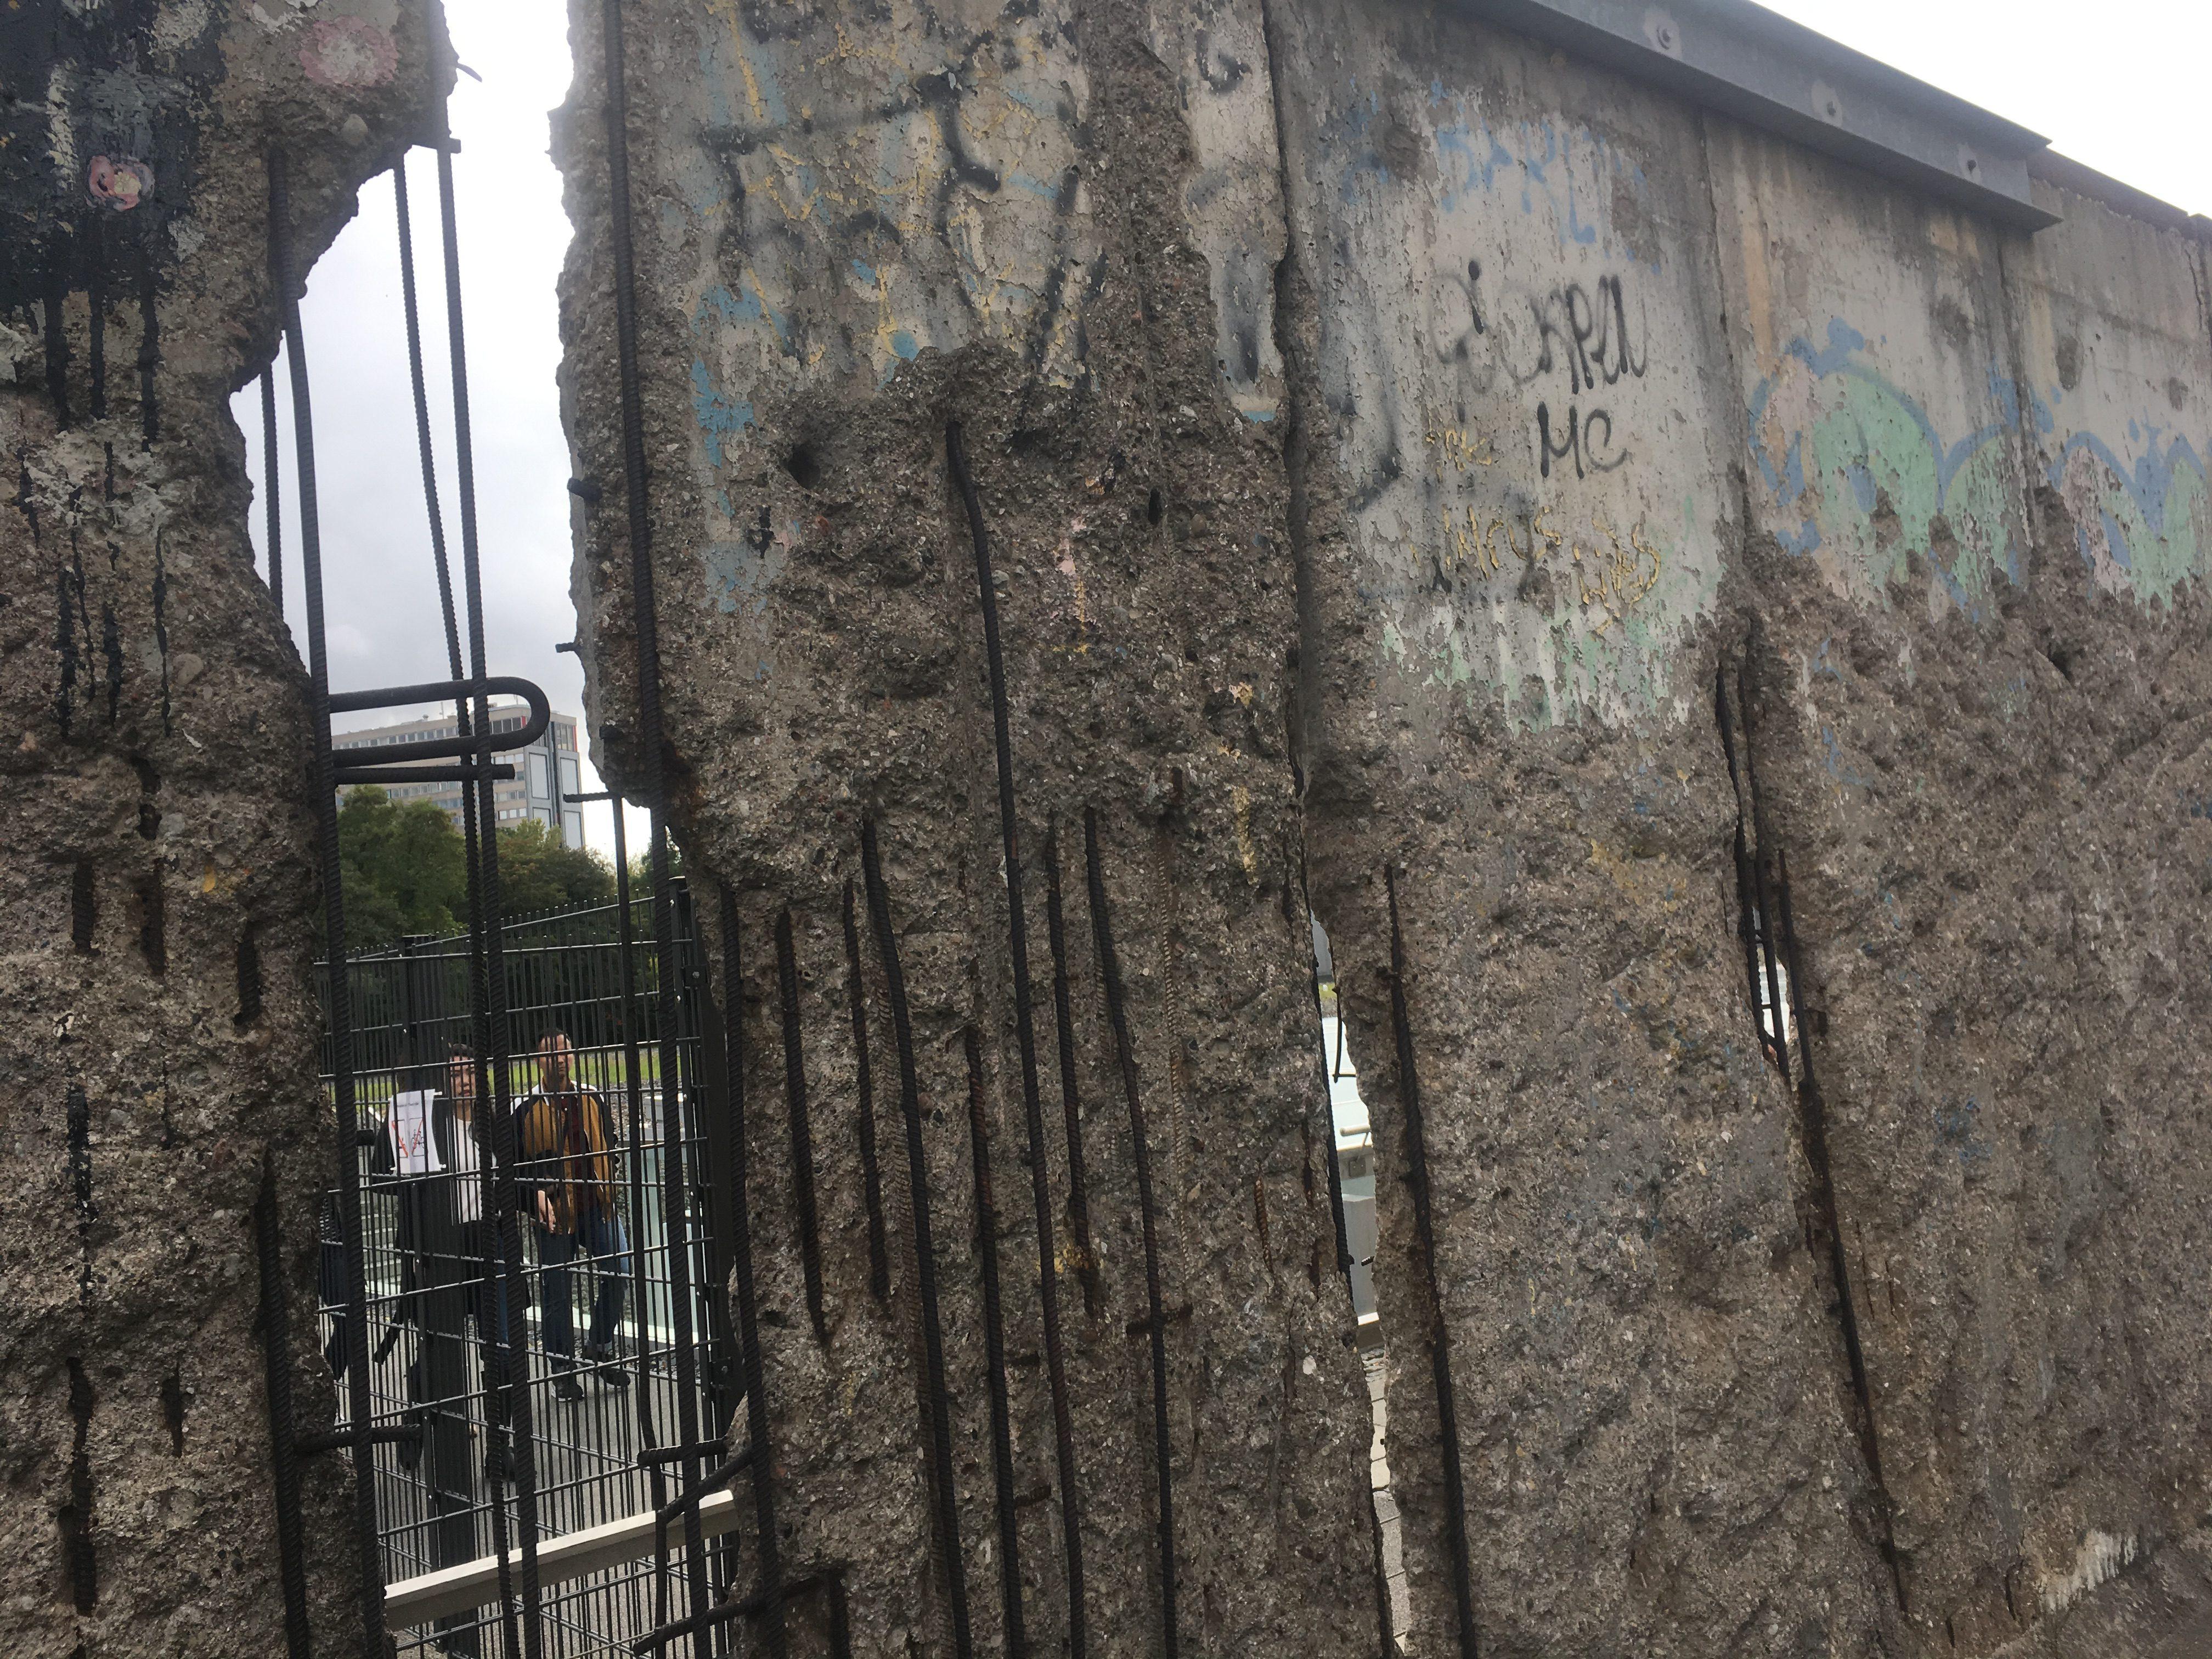 The Berlin wall seems so flimsy now